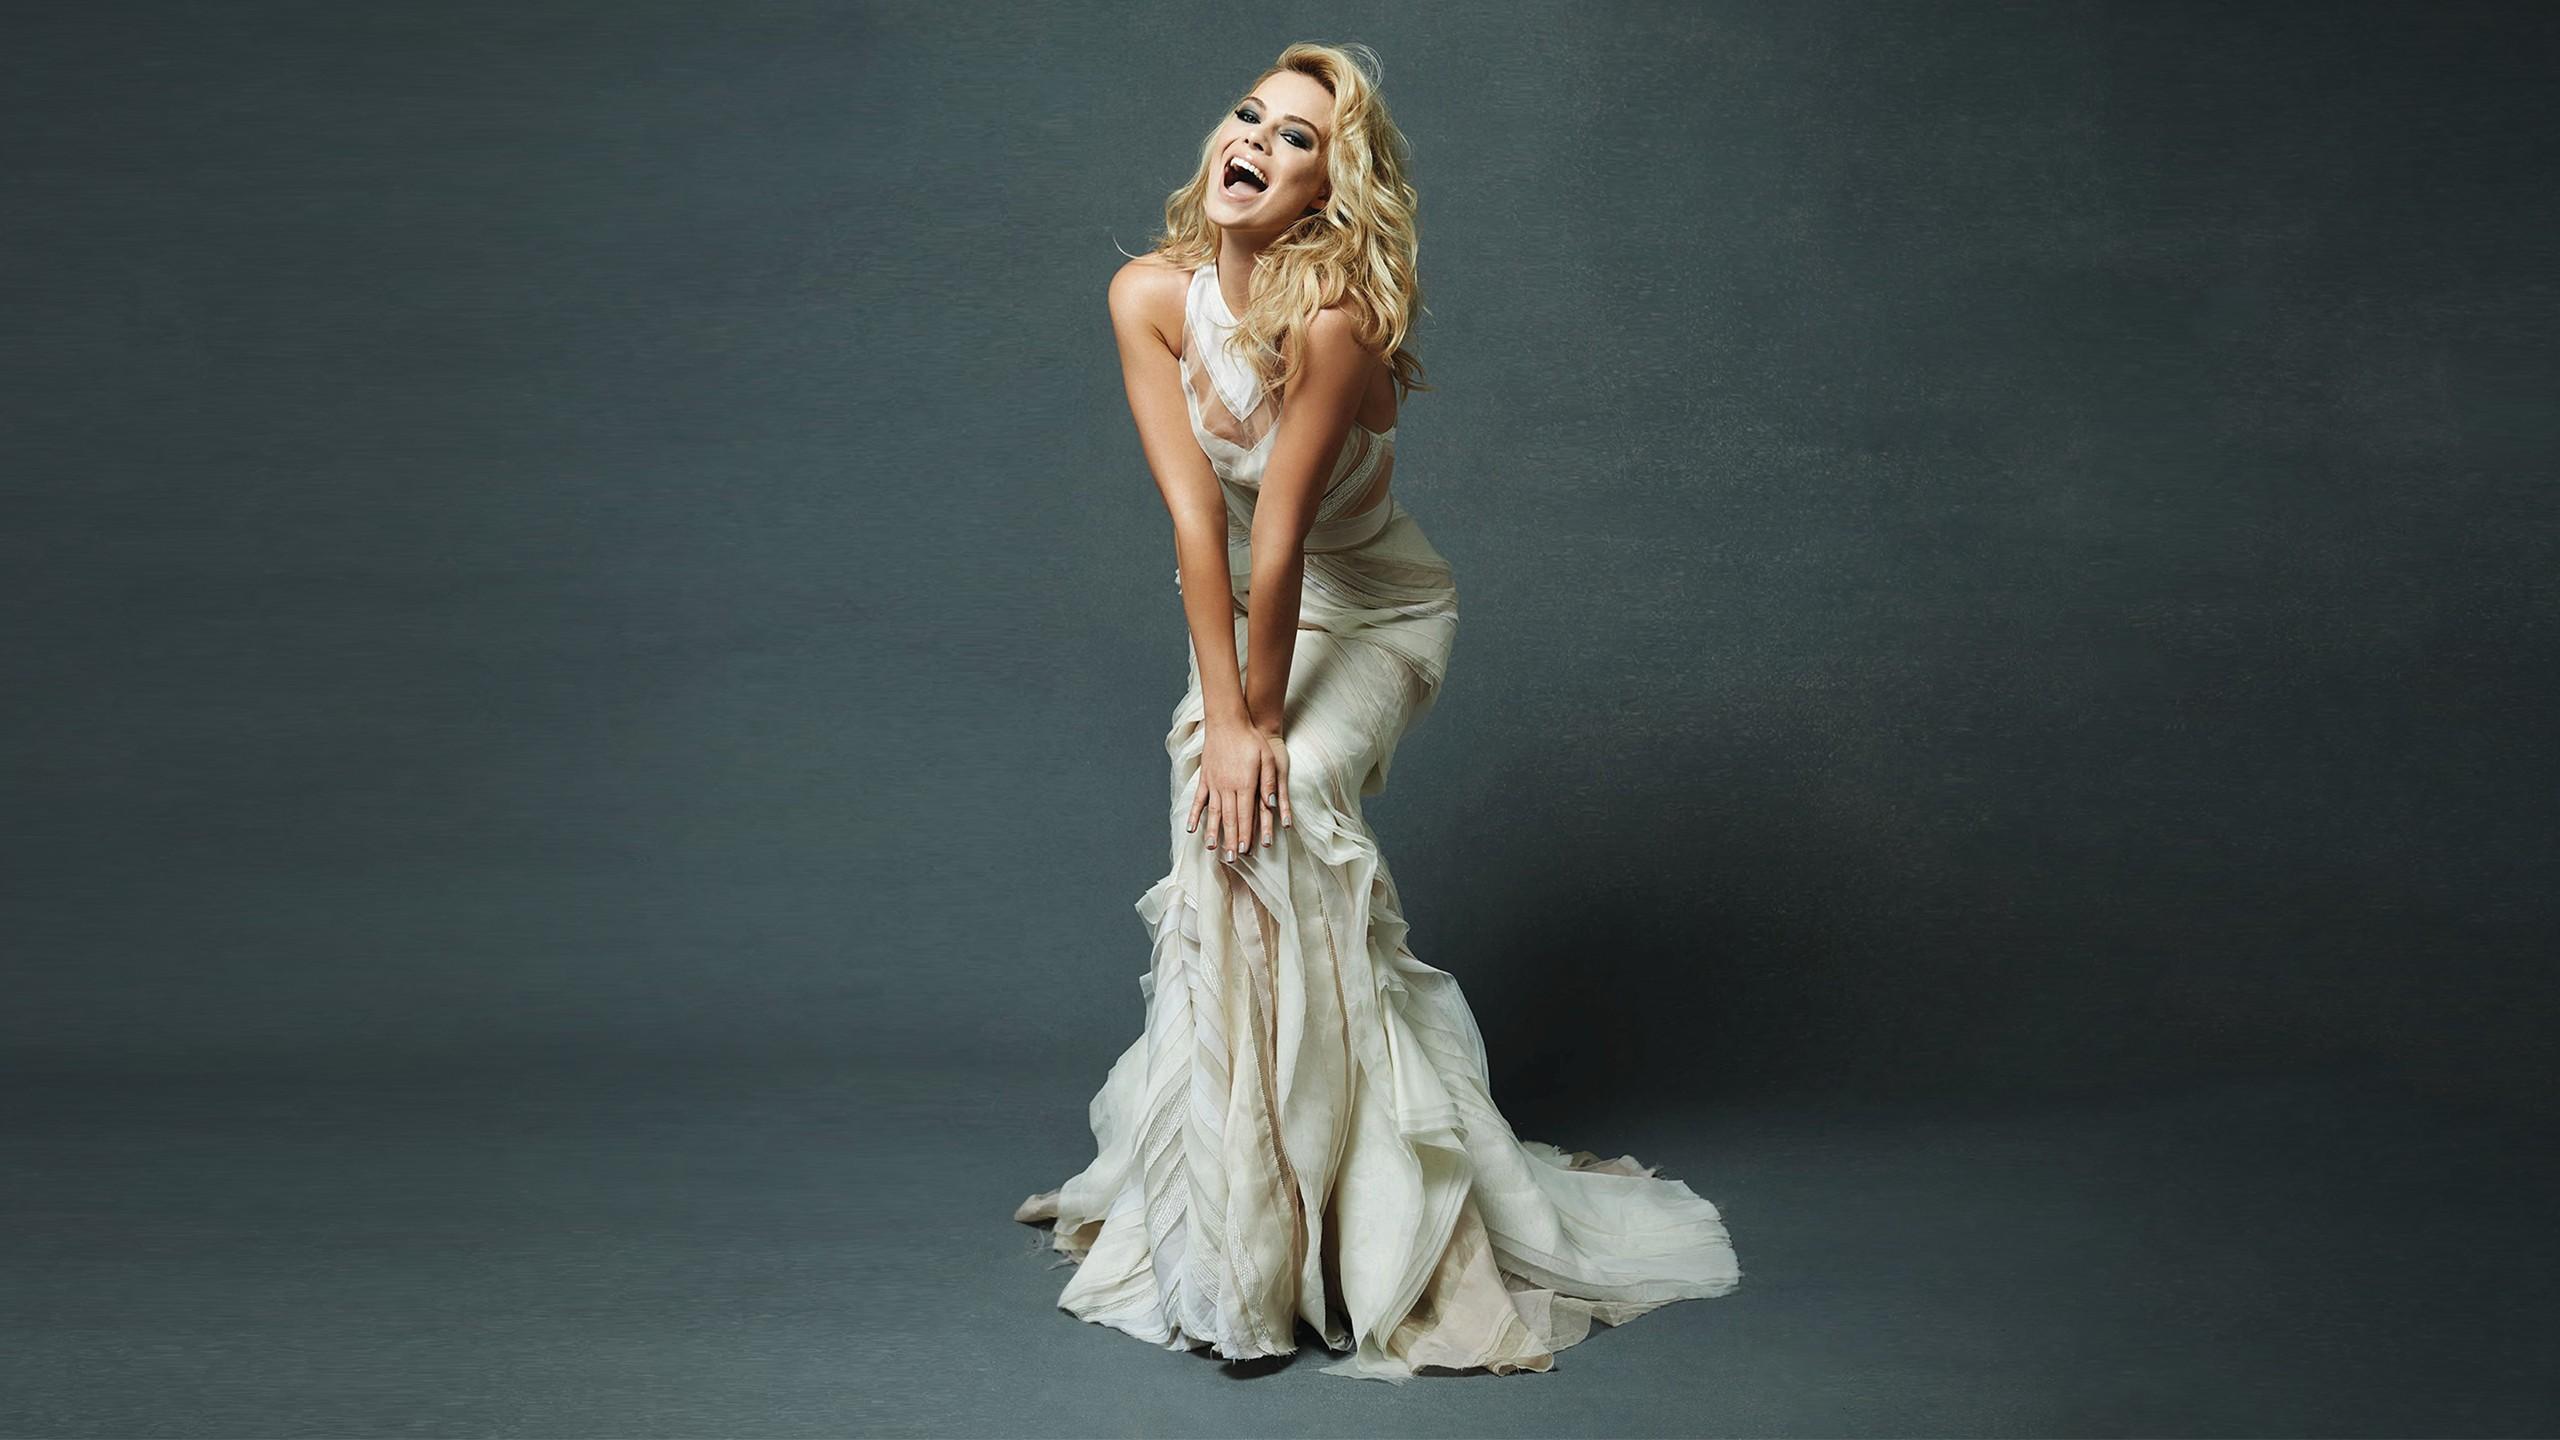 Indian Girl Wallpaper Free Download Margot Robbie White Dress Hd Celebrities 4k Wallpapers